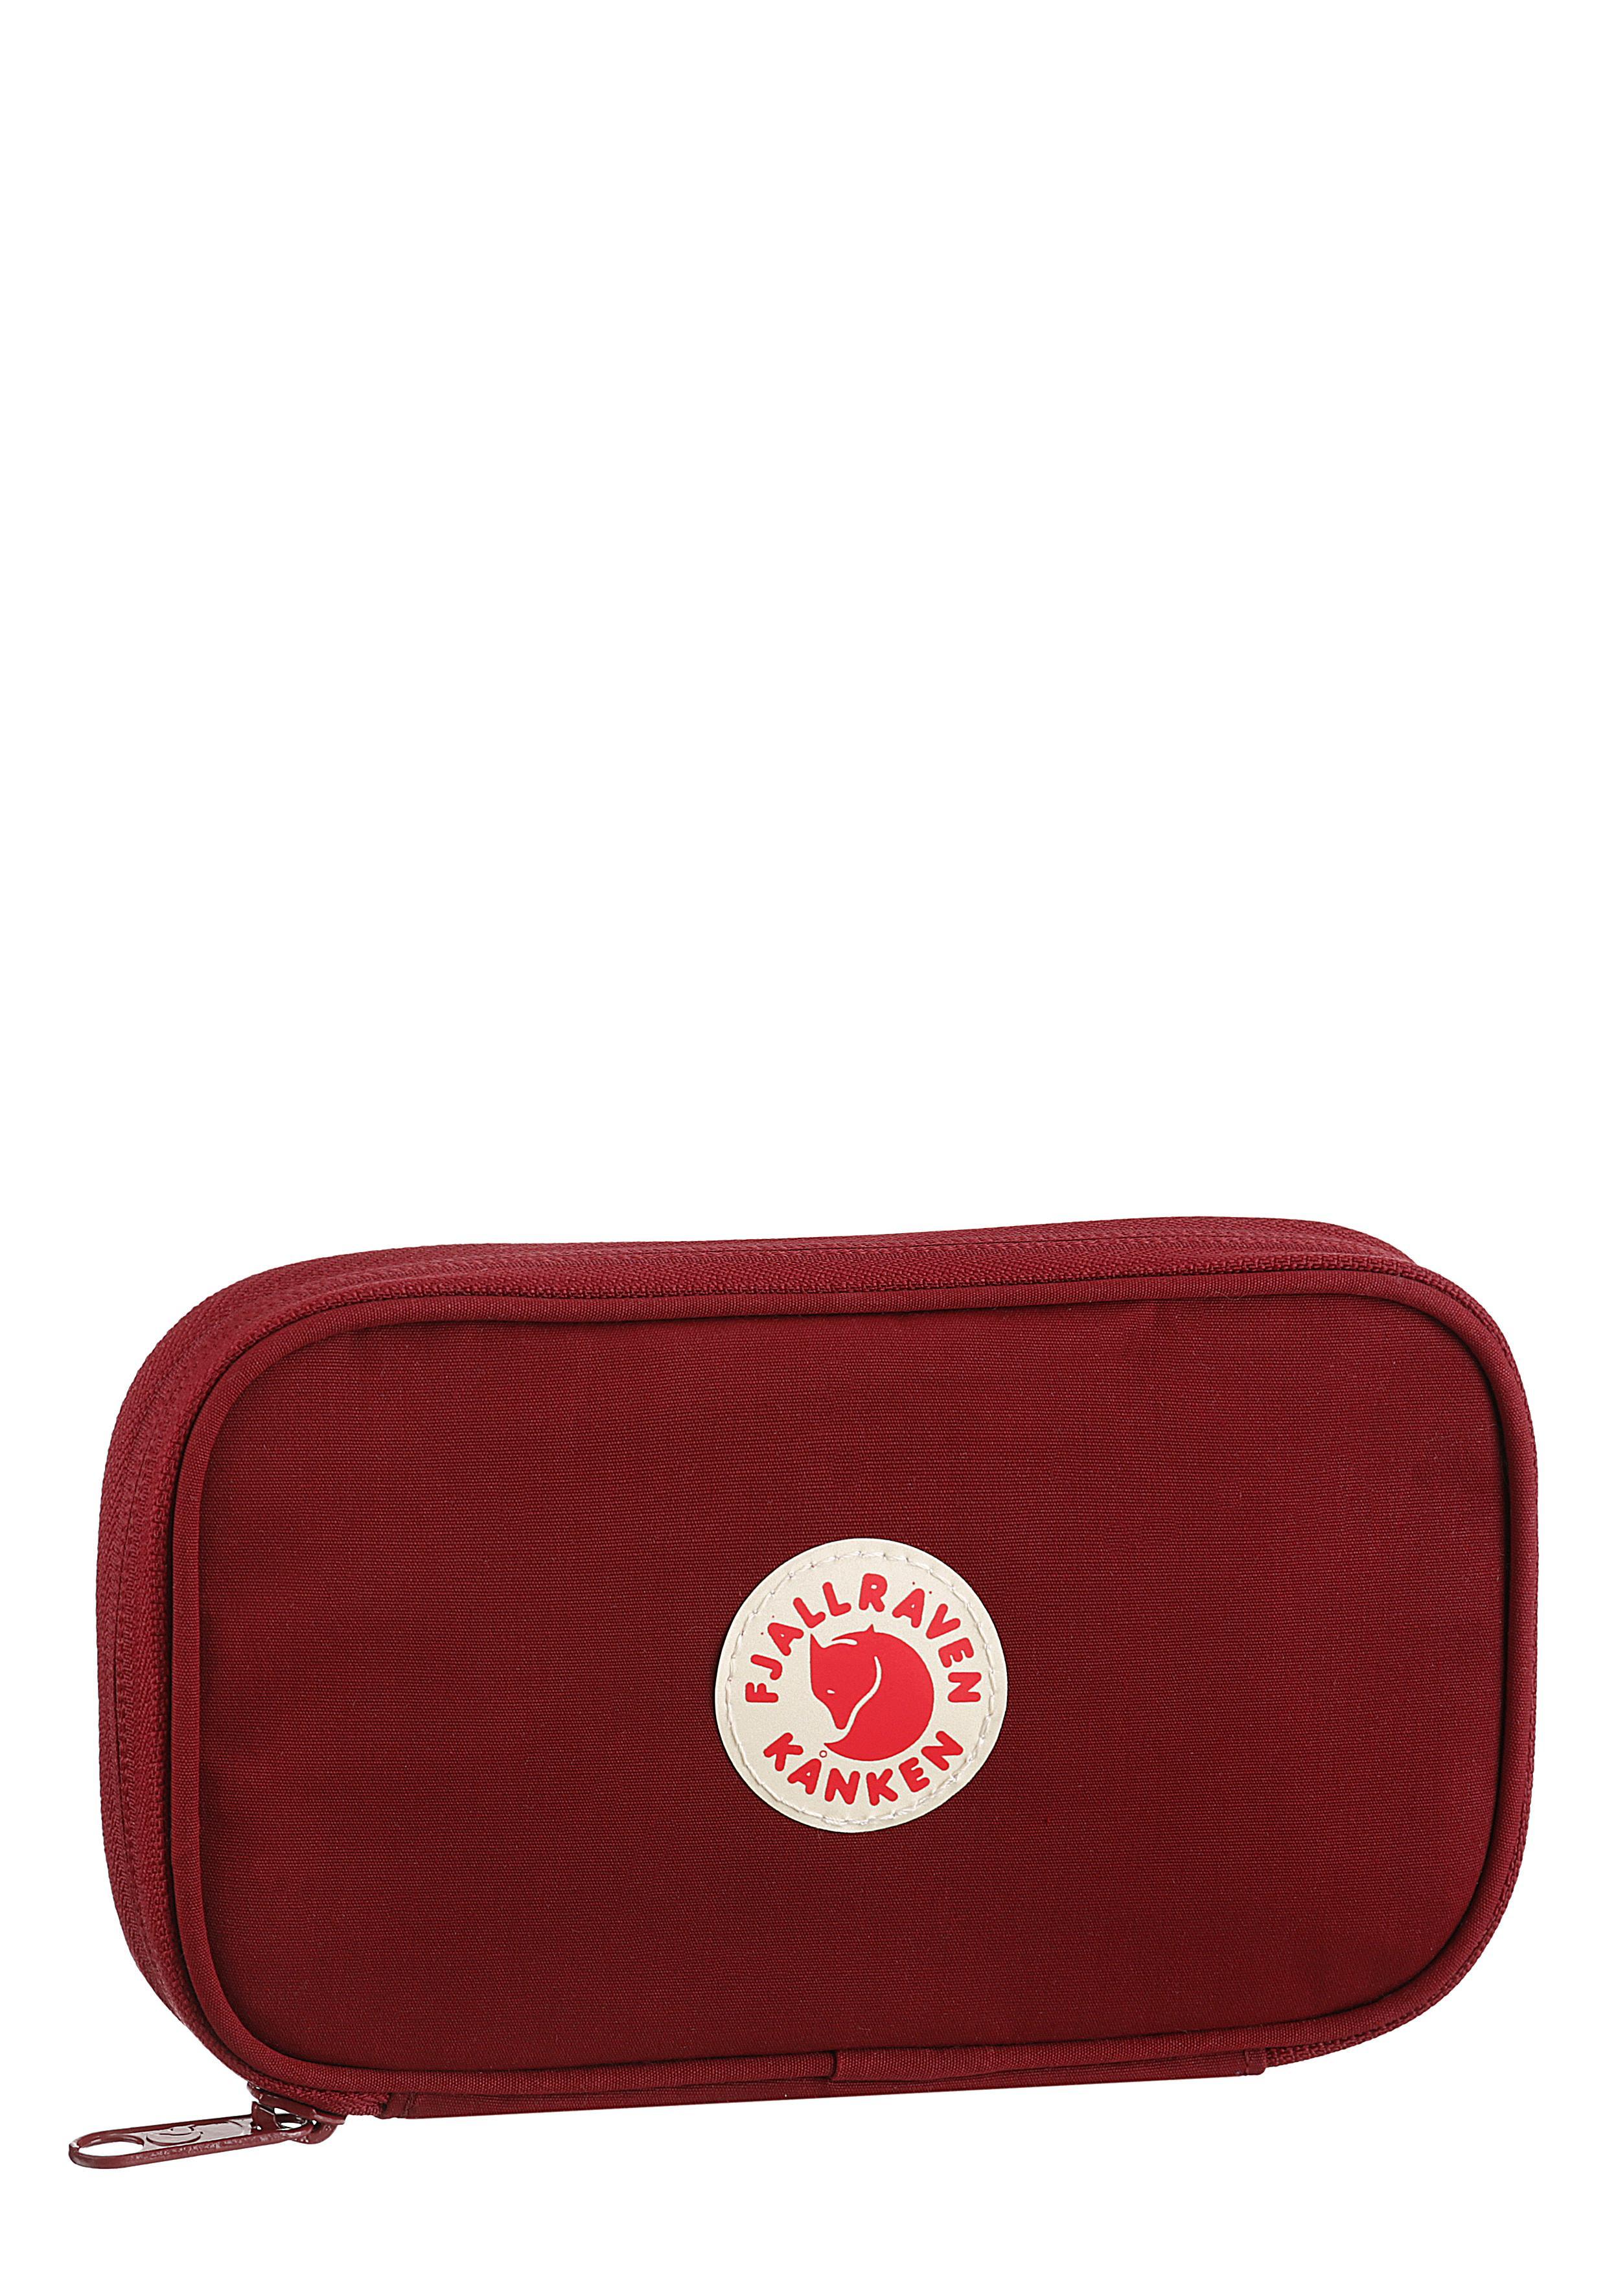 Fjällräven Brieftasche | Accessoires > Portemonnaies > Brieftaschen | FJÄLLRÄVEN